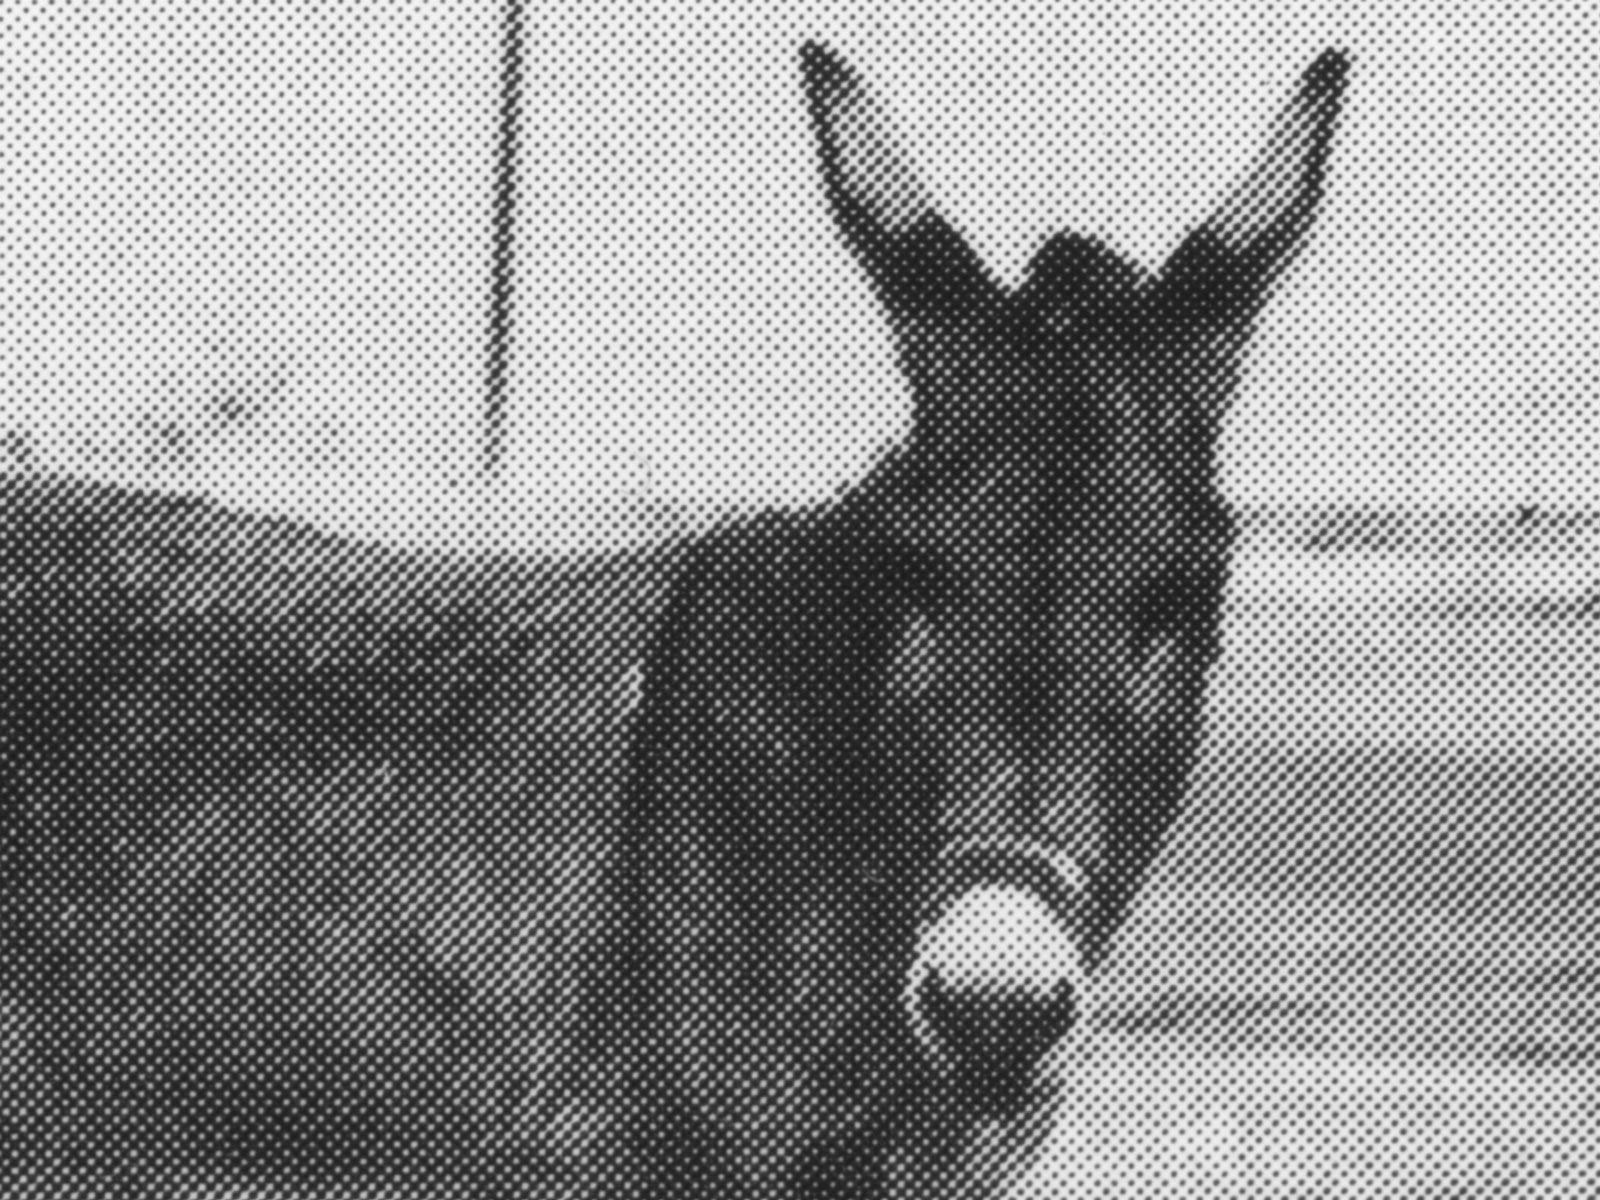 donkey_print_detail2.jpg